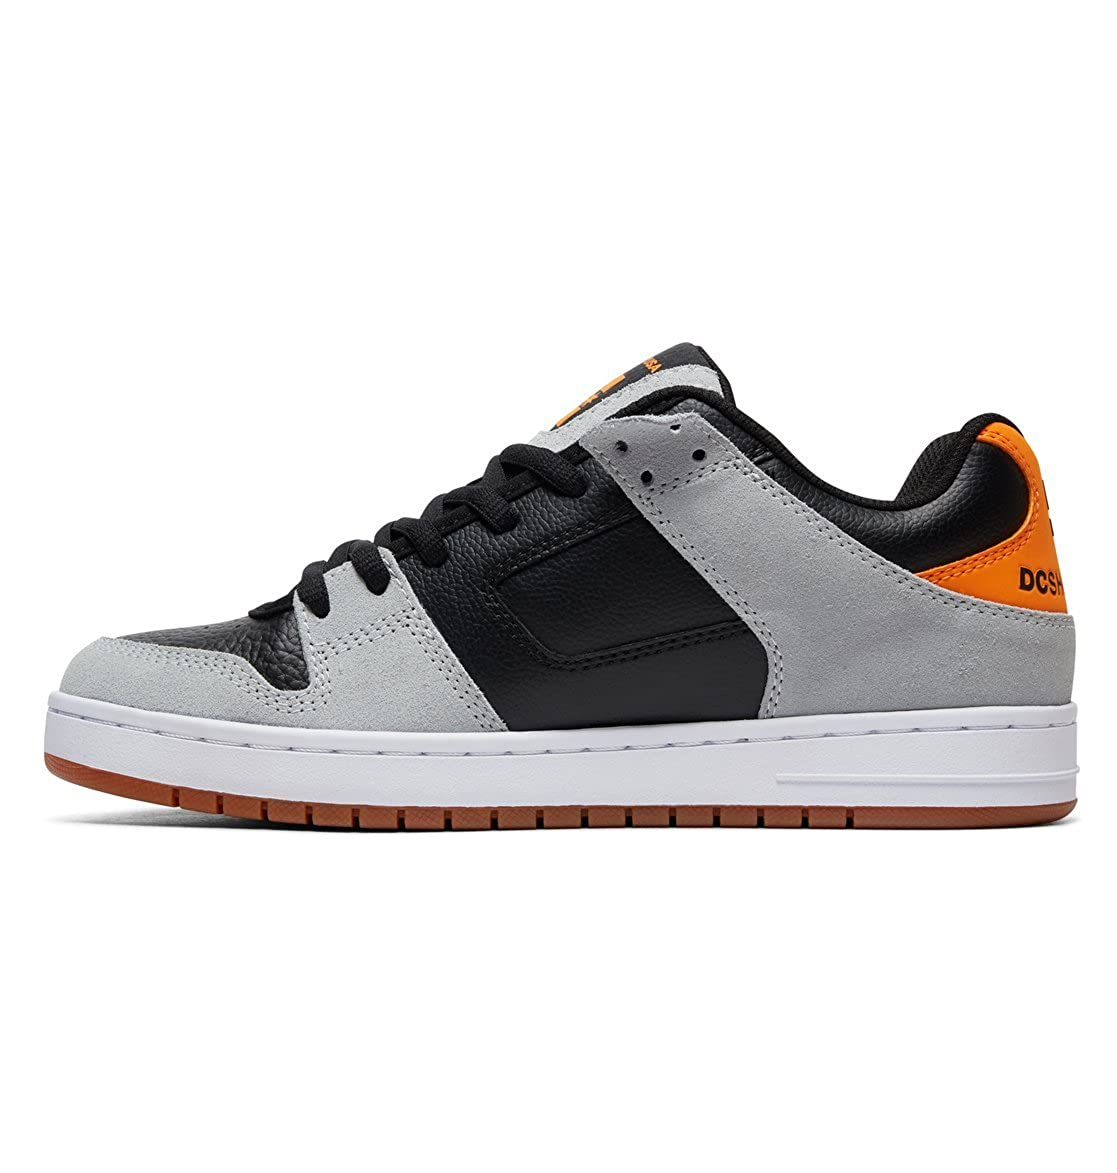 Pantufla Hombre DC ShoesMANTECA M Shoe